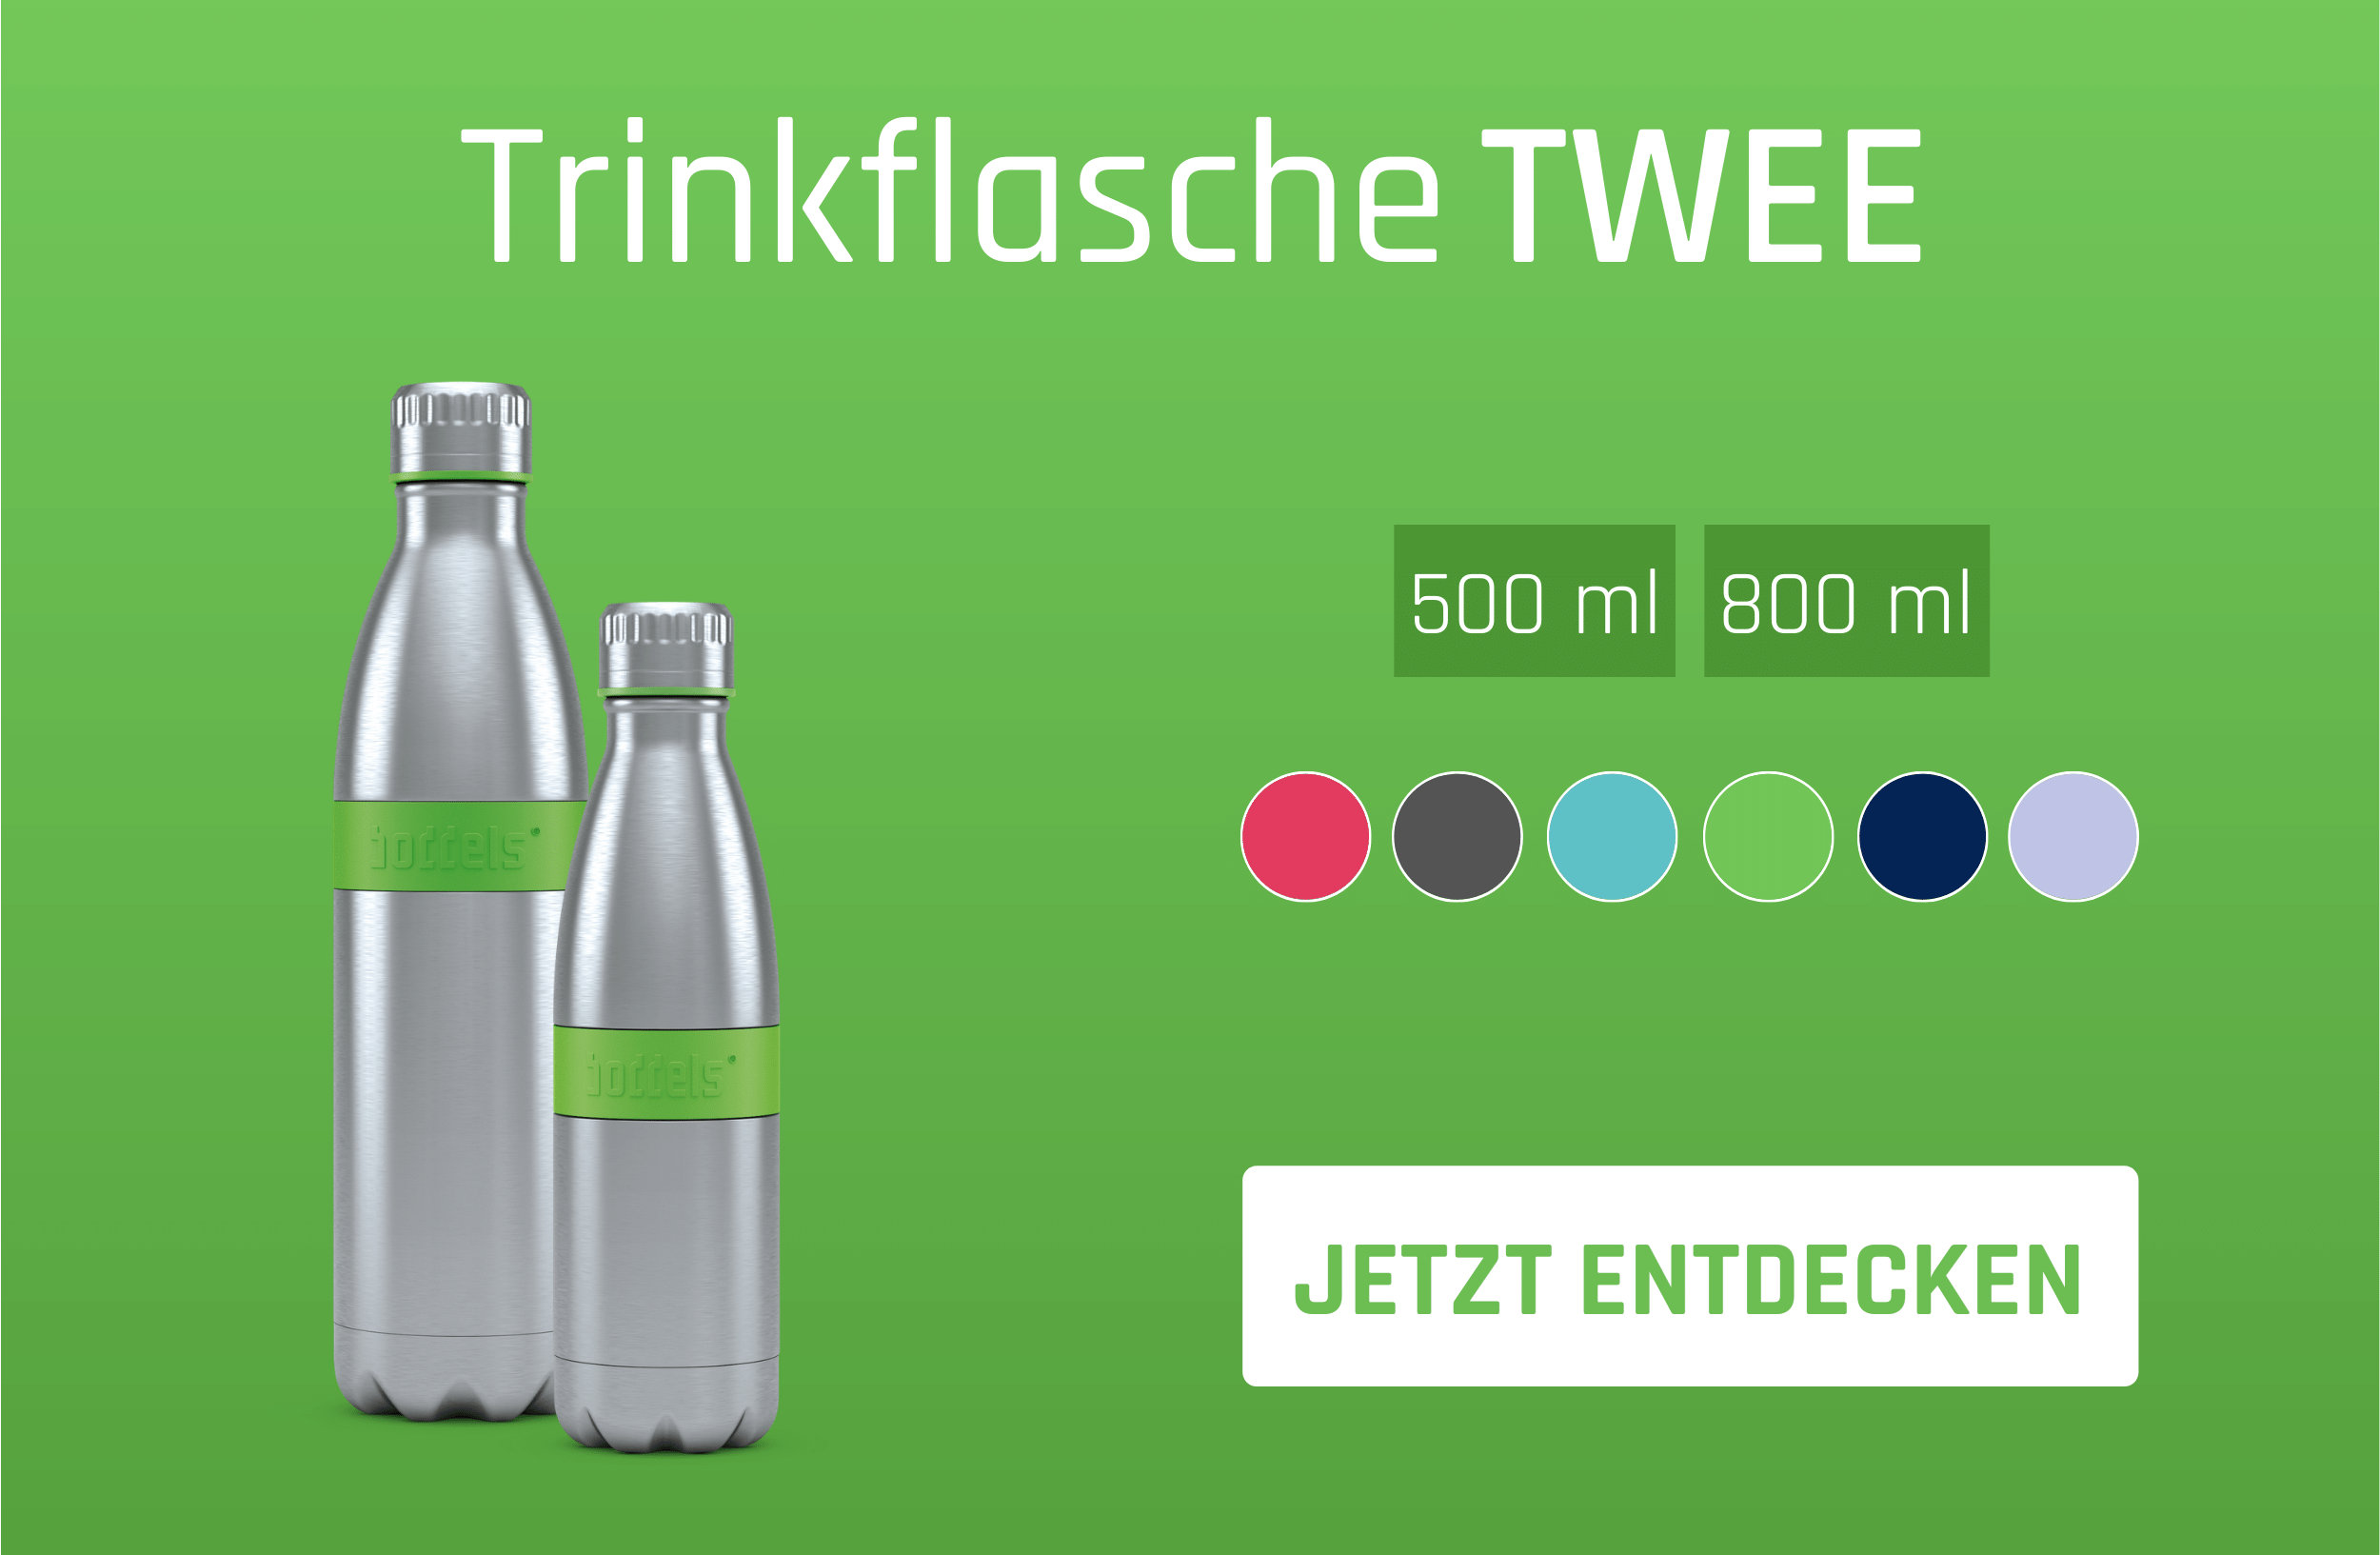 Trinkflasche TWEE